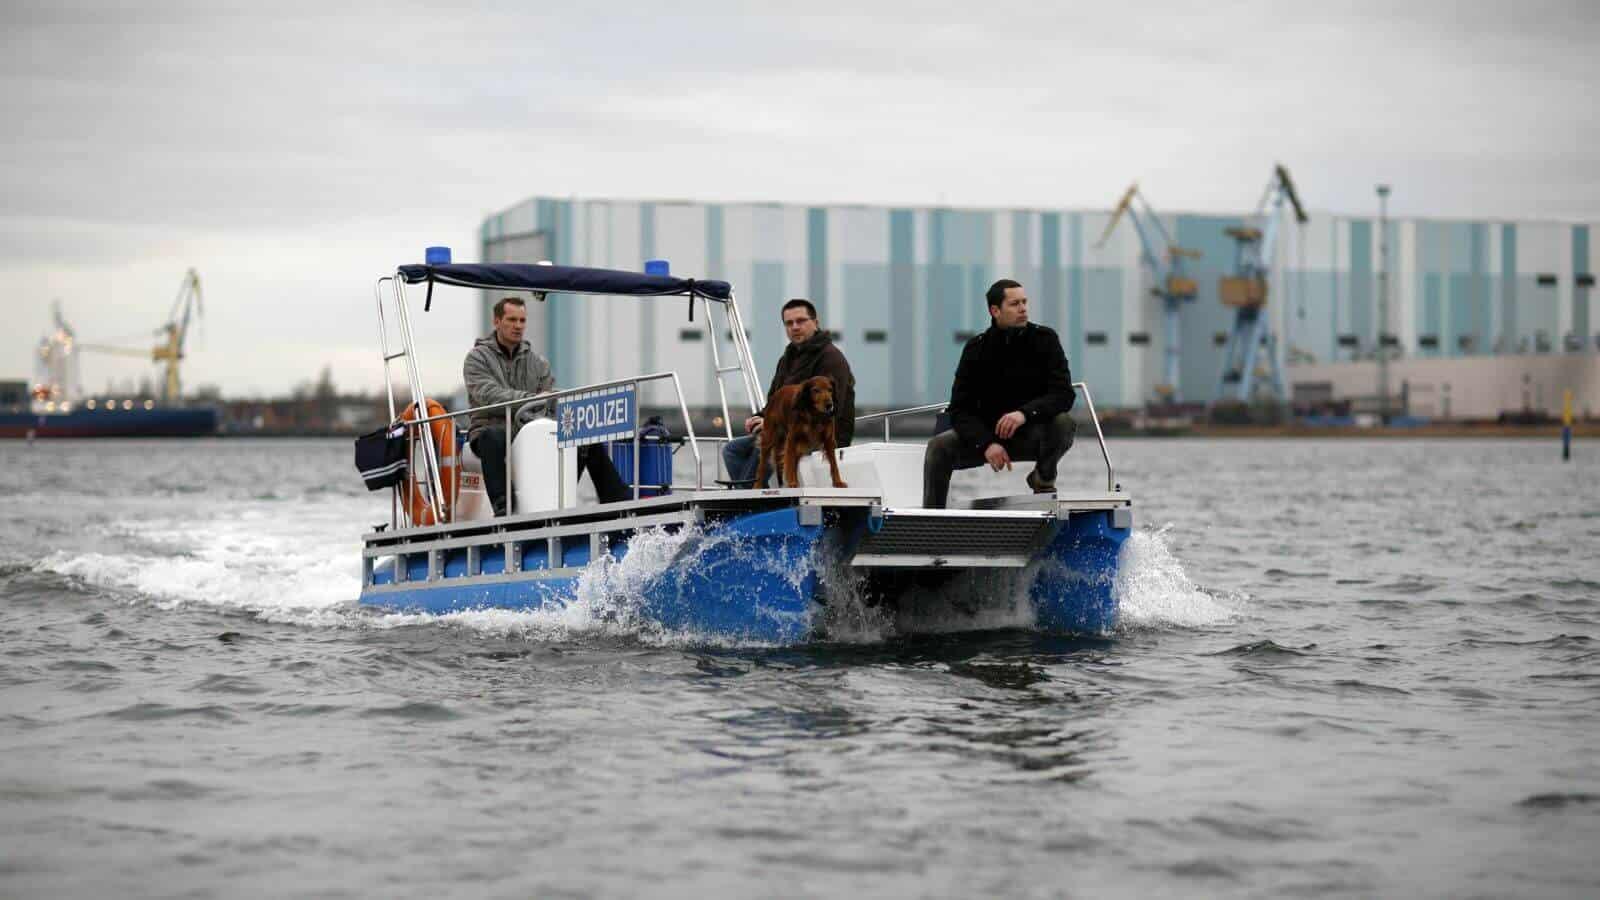 Polizei Pontonboot